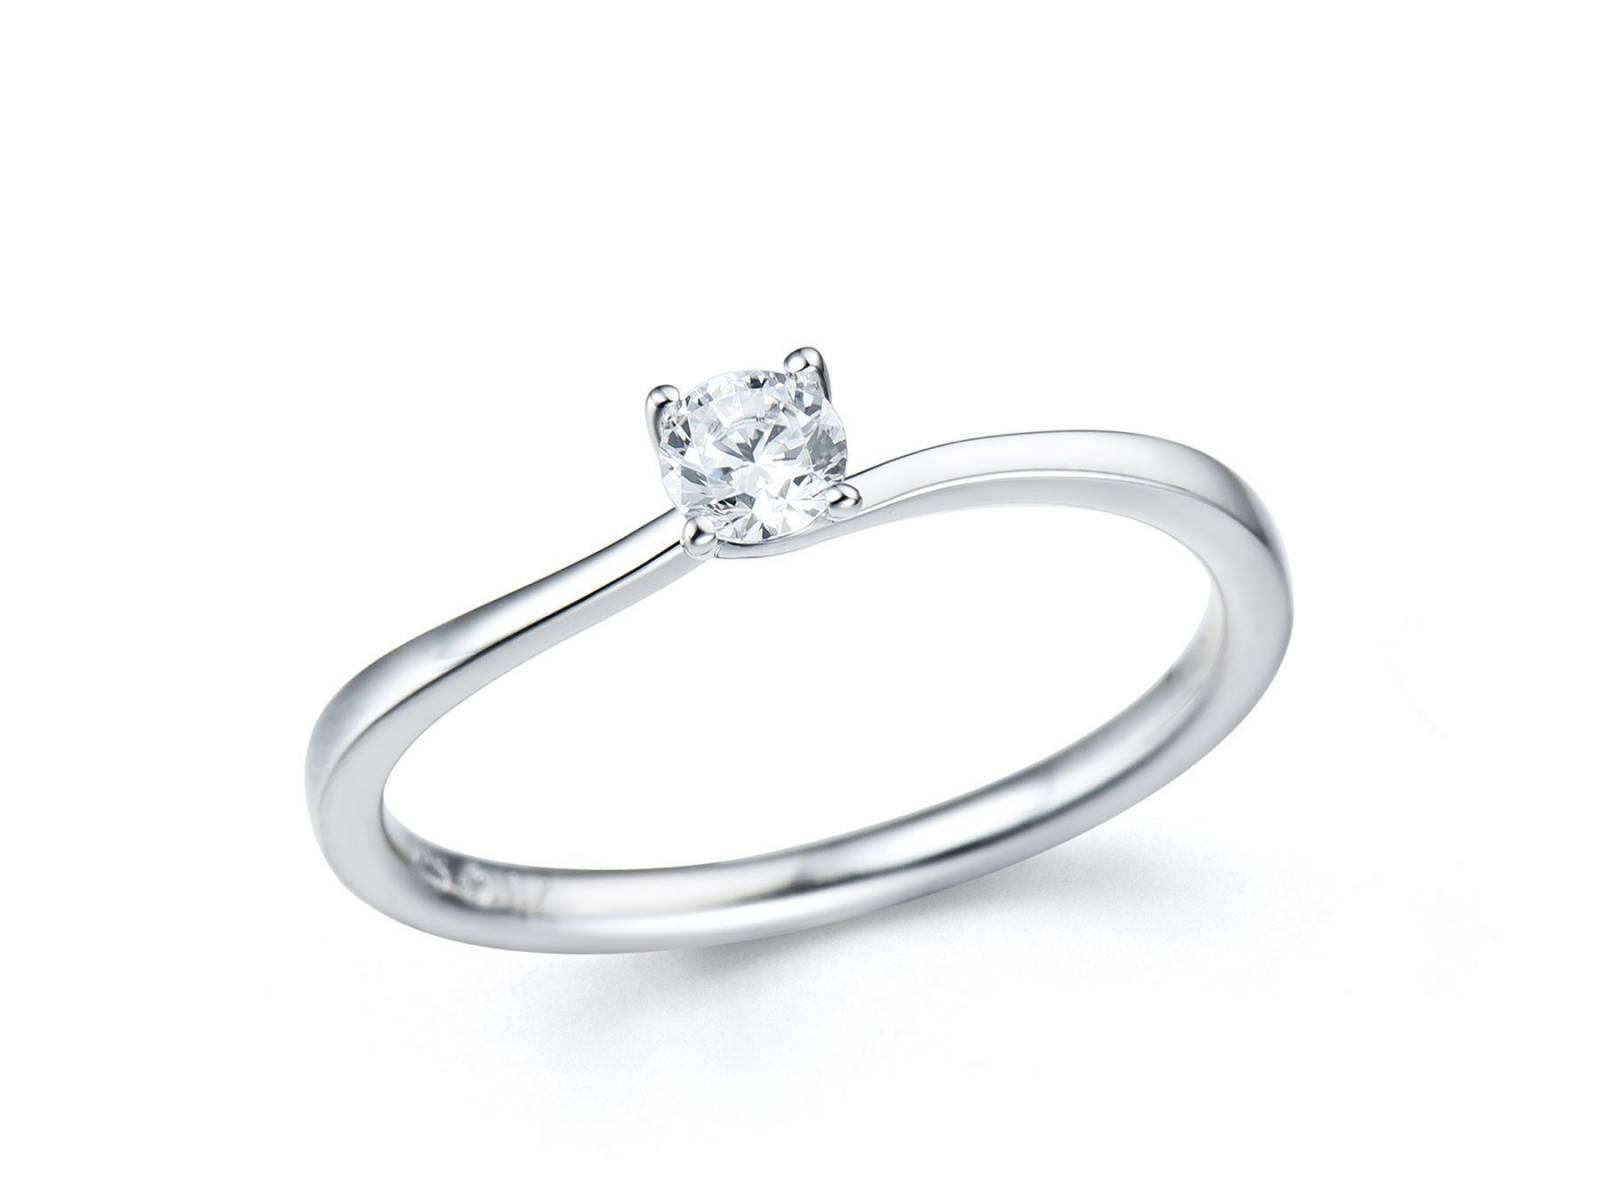 Juwelen Vanquaethem - House of Weddings (9)